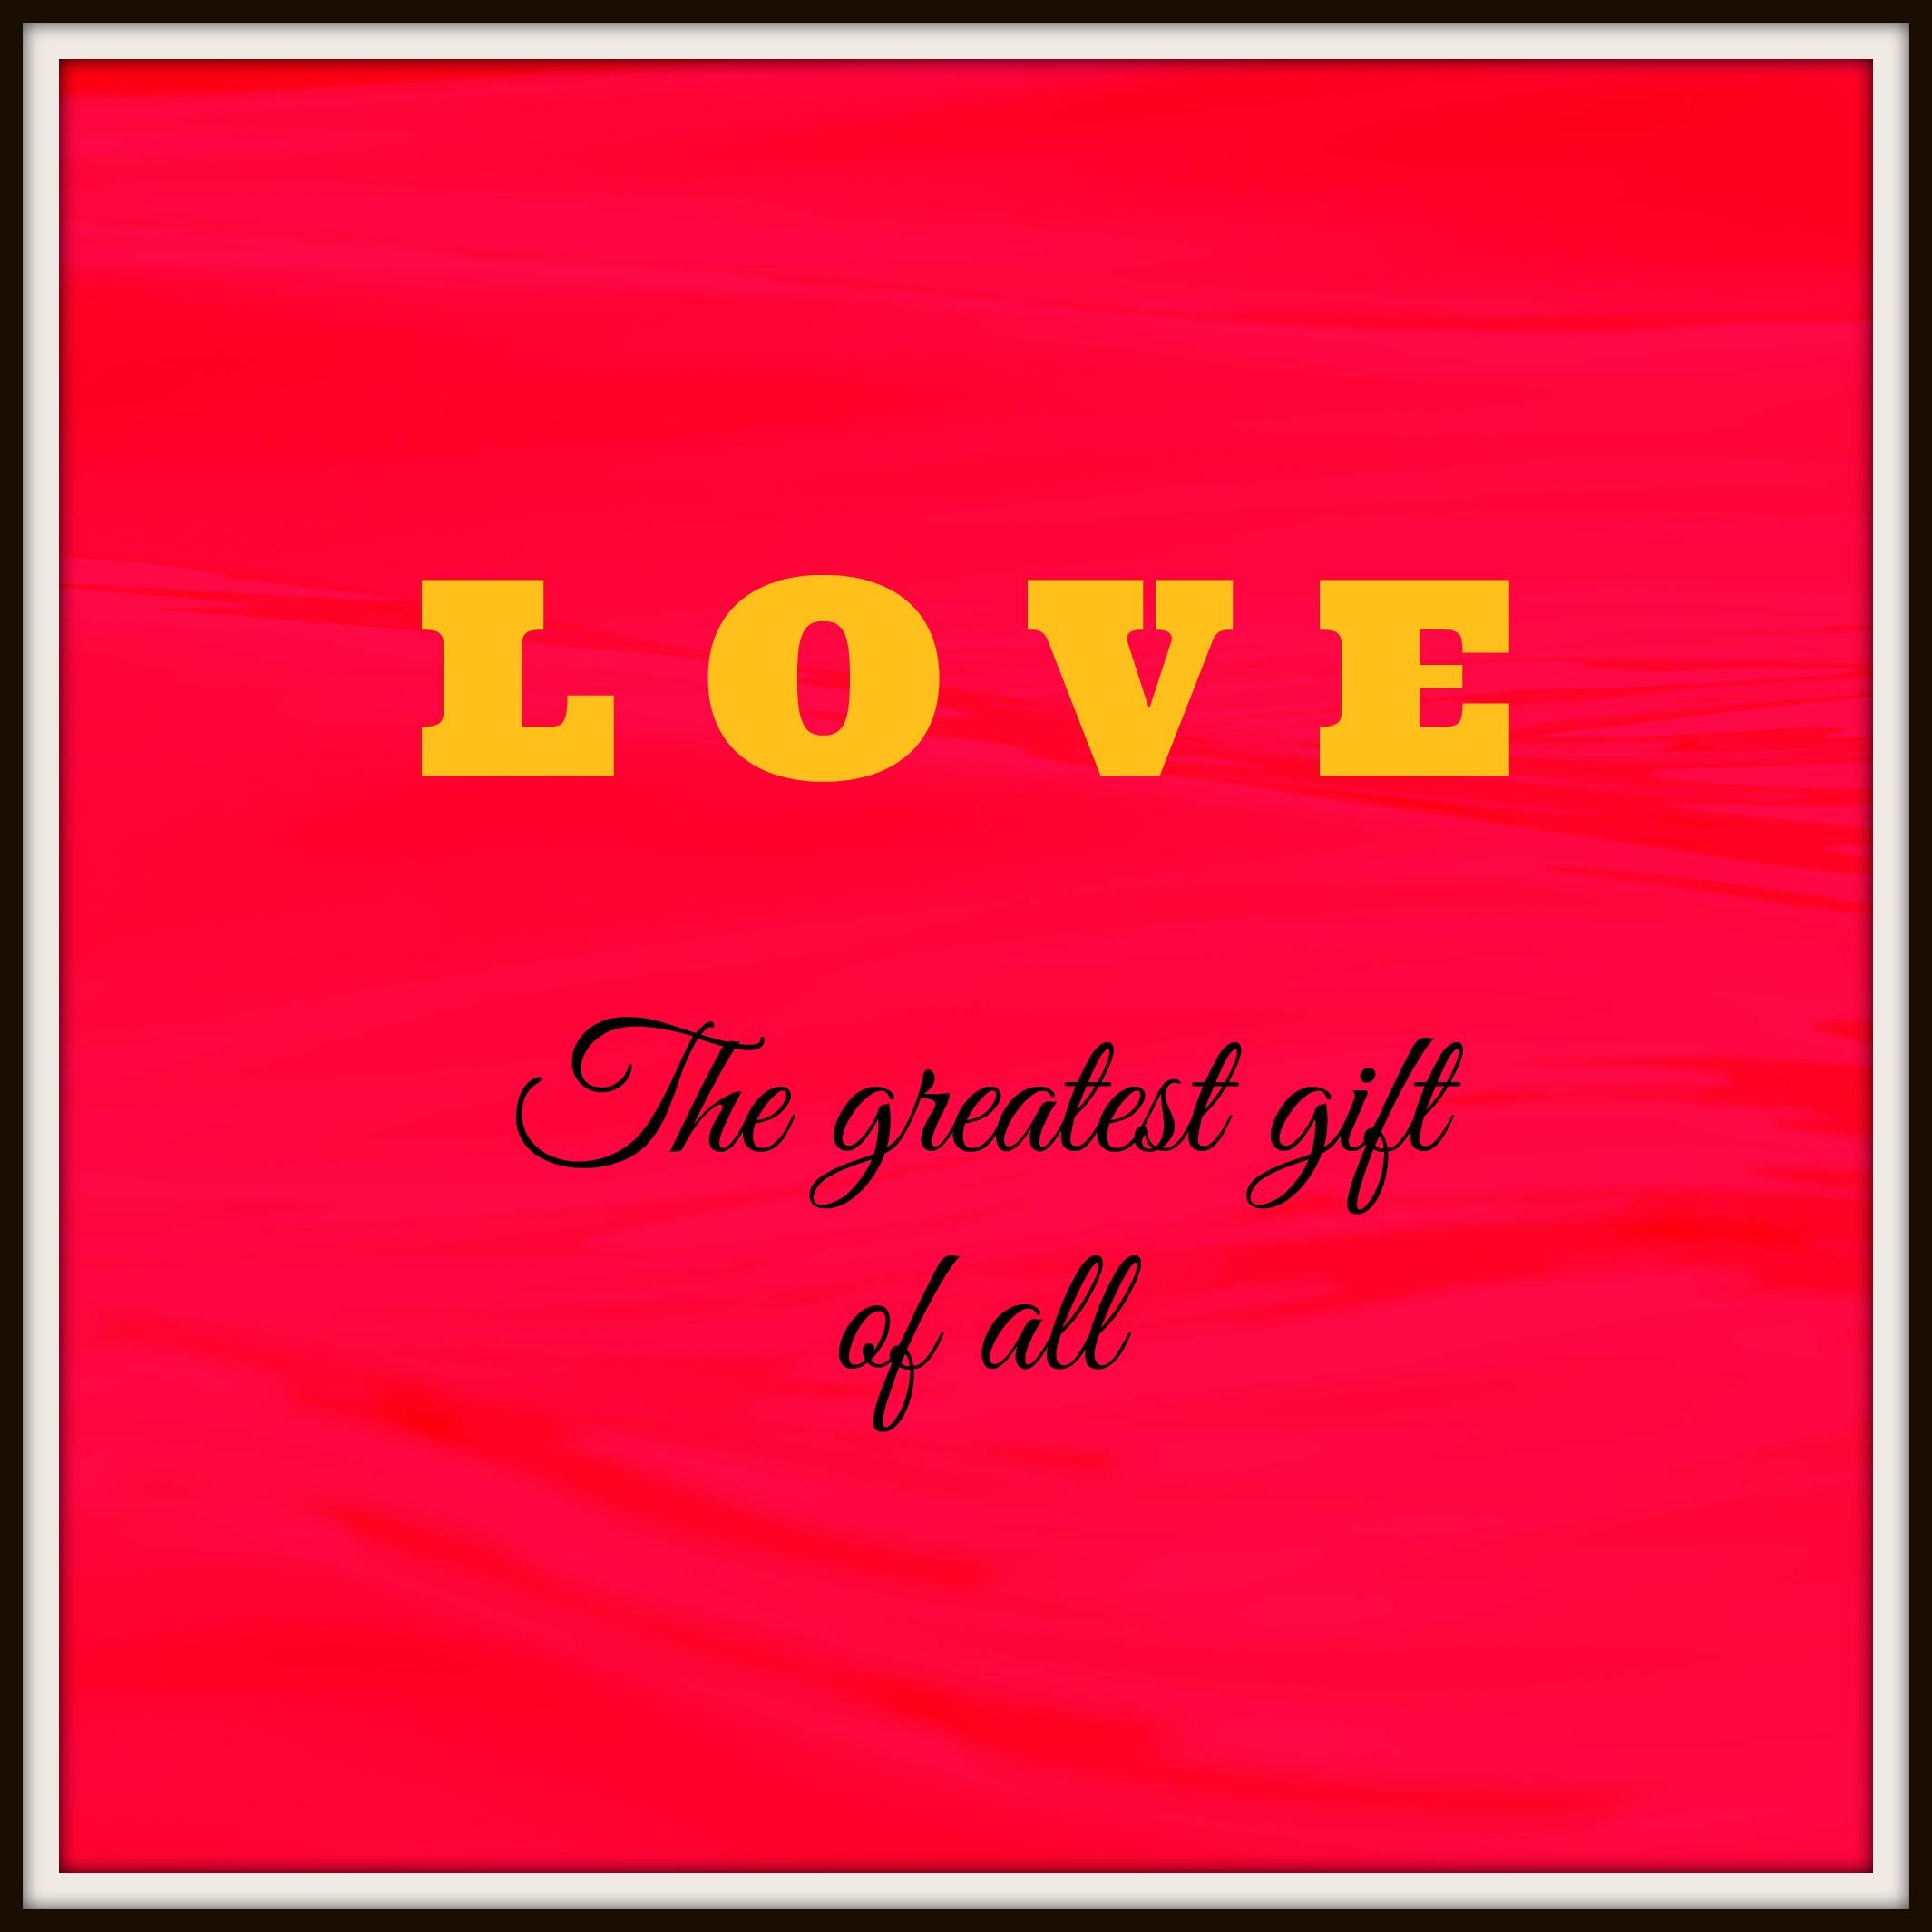 LOVE at CHRISTMAS | NORMA L. BRUMBAUGH